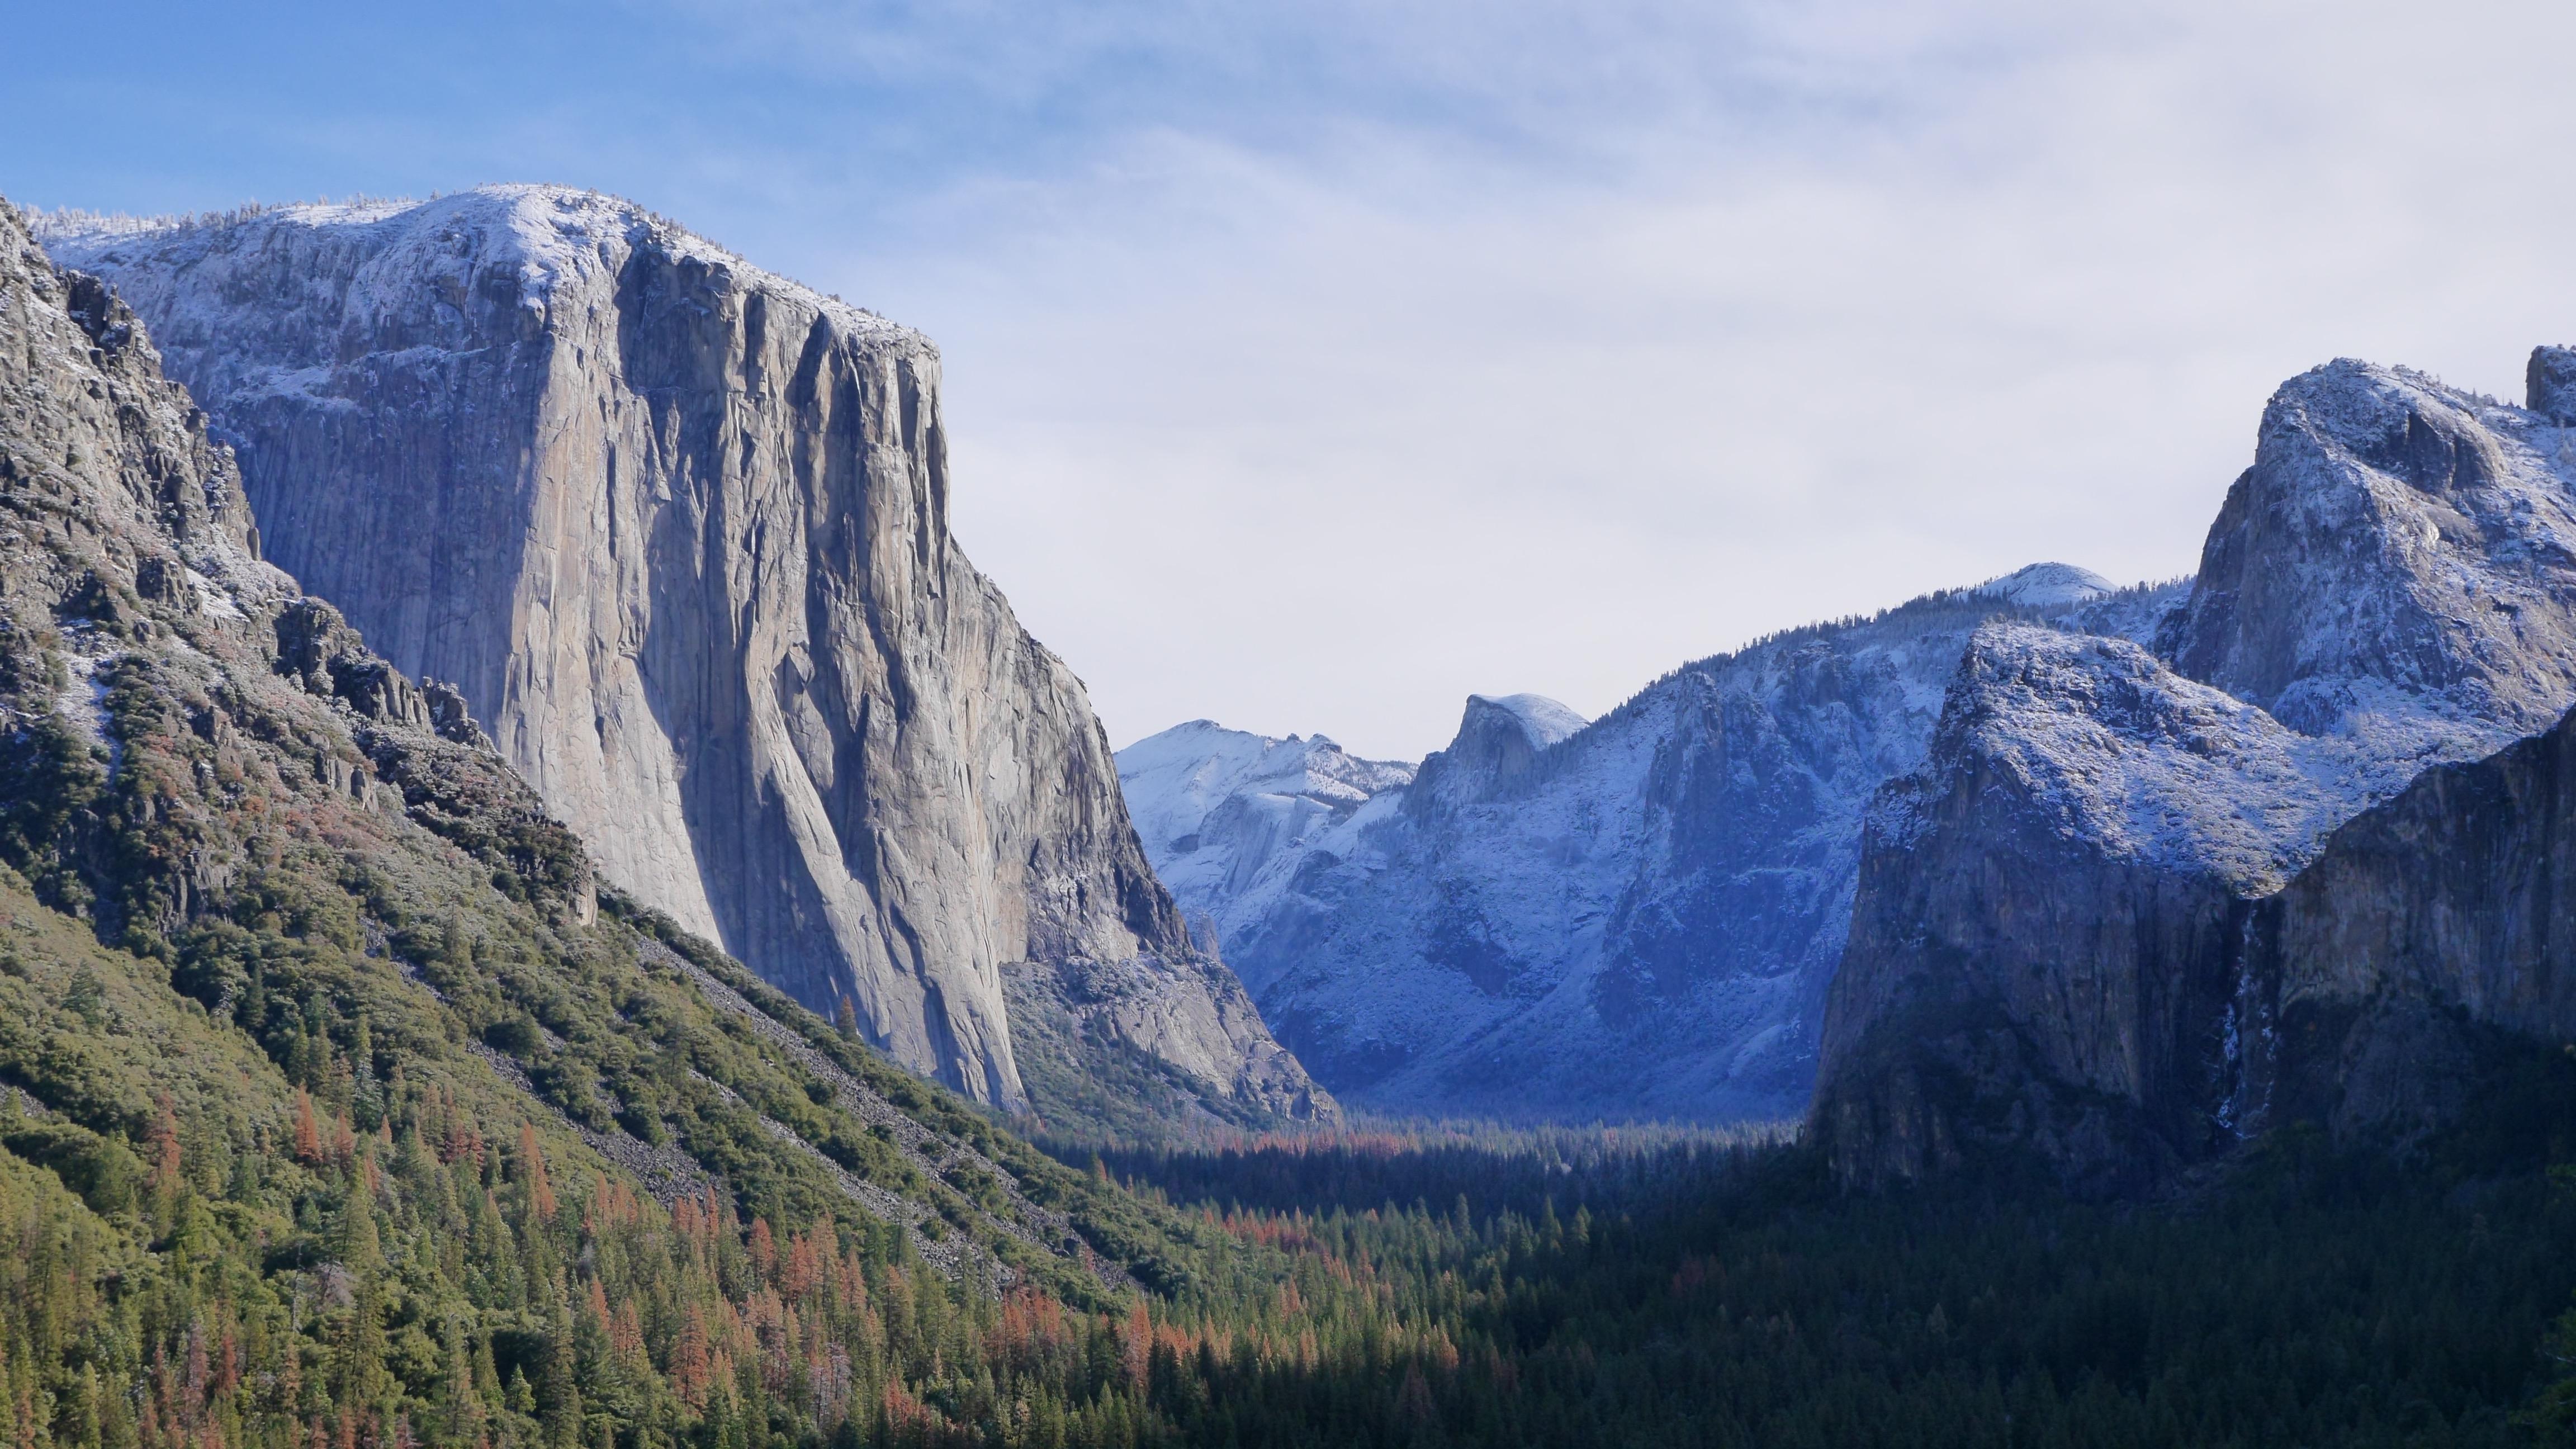 Valley clipart story mountain PBS Himalayas Nature 0:52:58 Himalayas